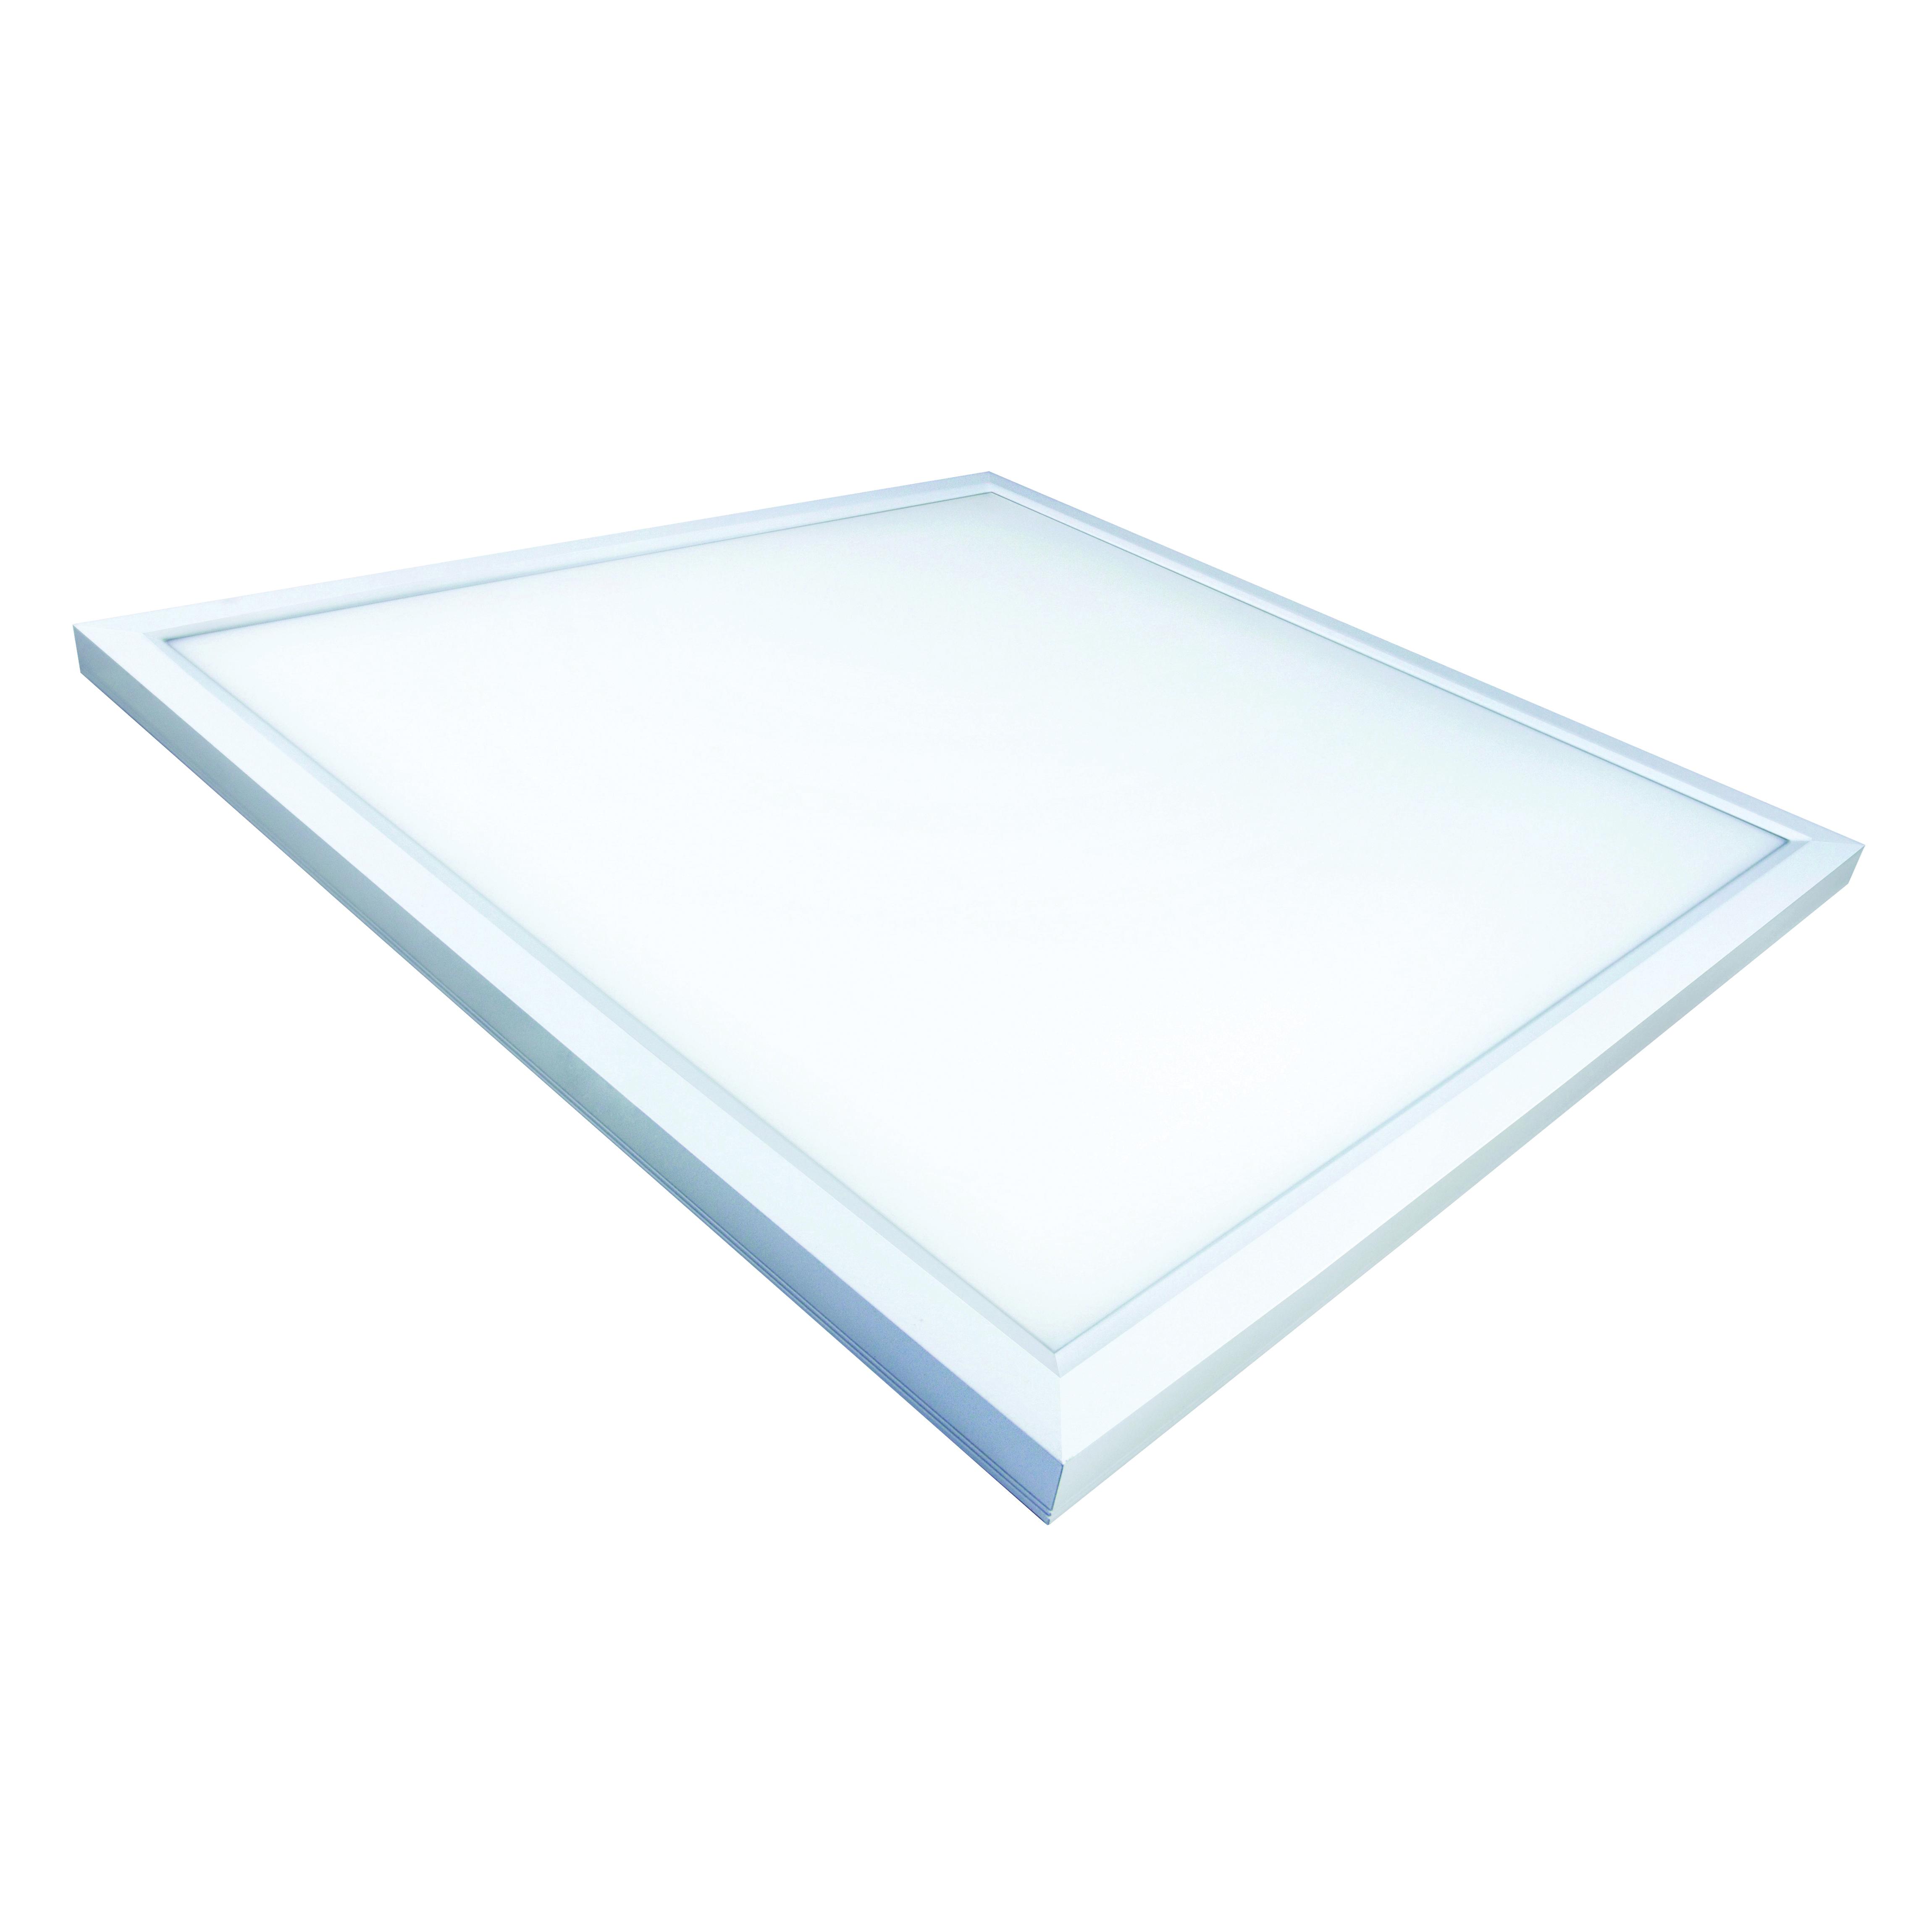 Picture of ETI 54320161 Flat-Panel Troffer, 120/277 VAC, 42.5 W, LED Lamp, 4250 Lumens, 5000 K Color Temp